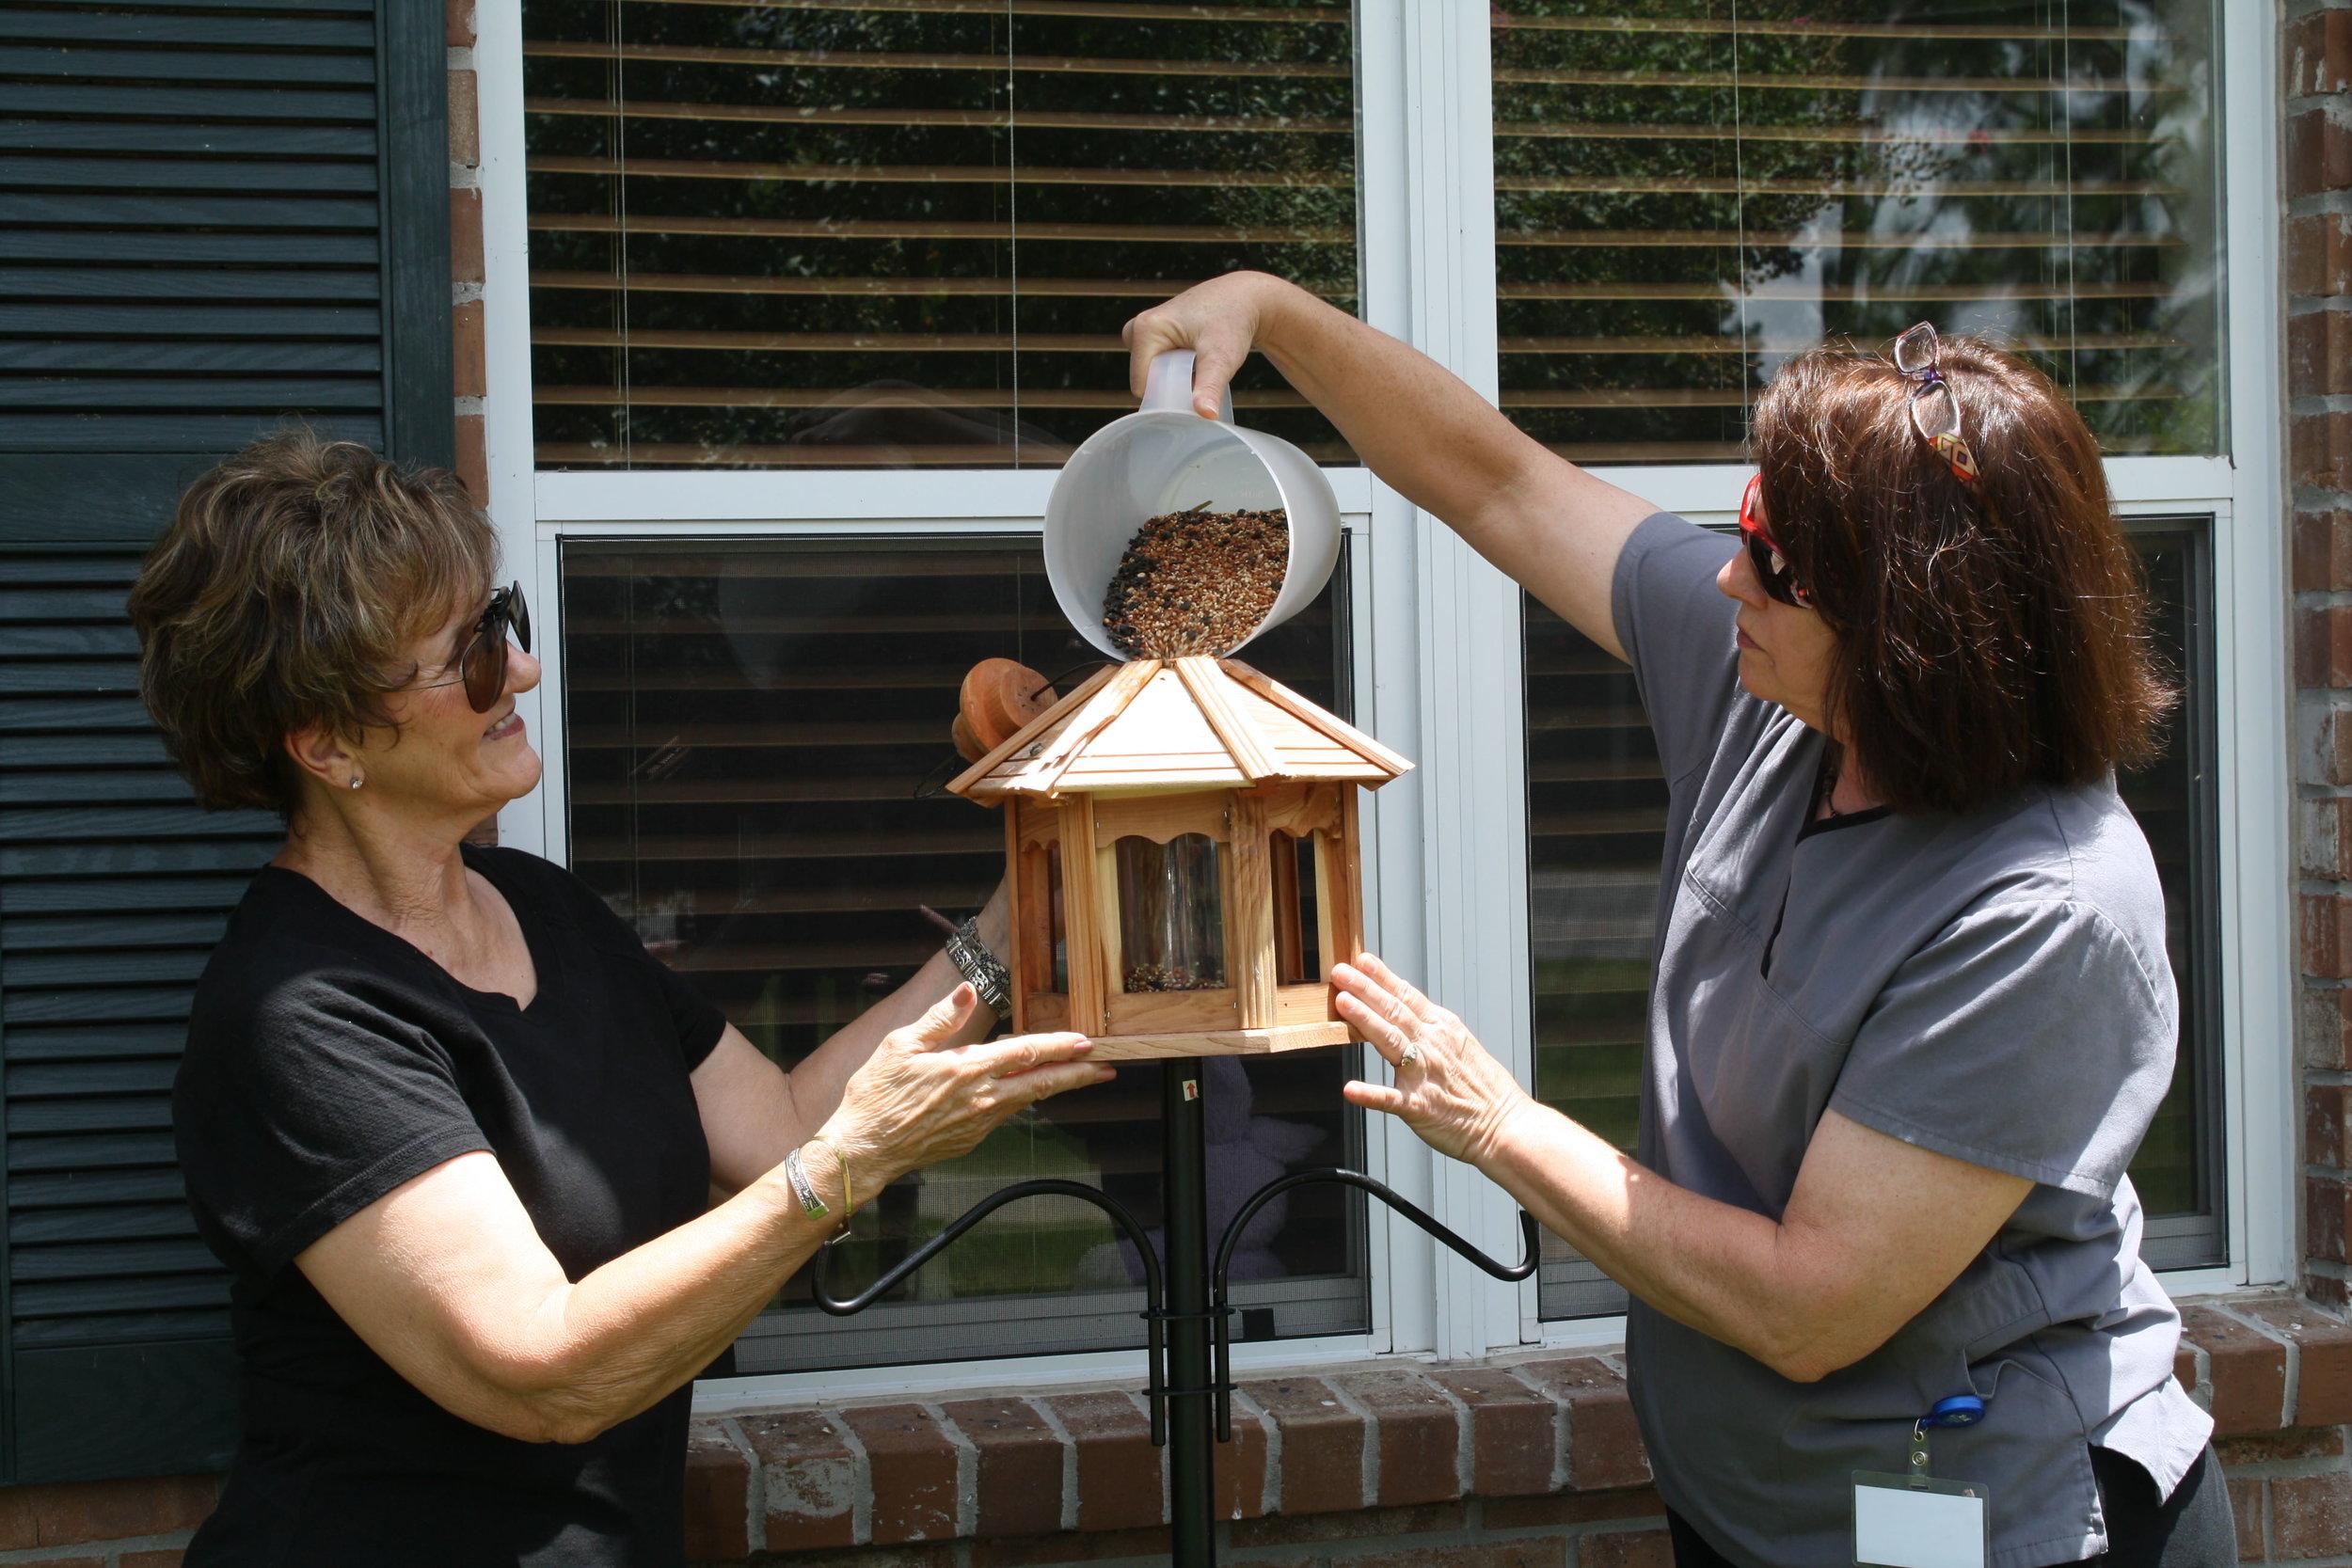 Jane Jarreau and Blanche Jewell refill bird feeder